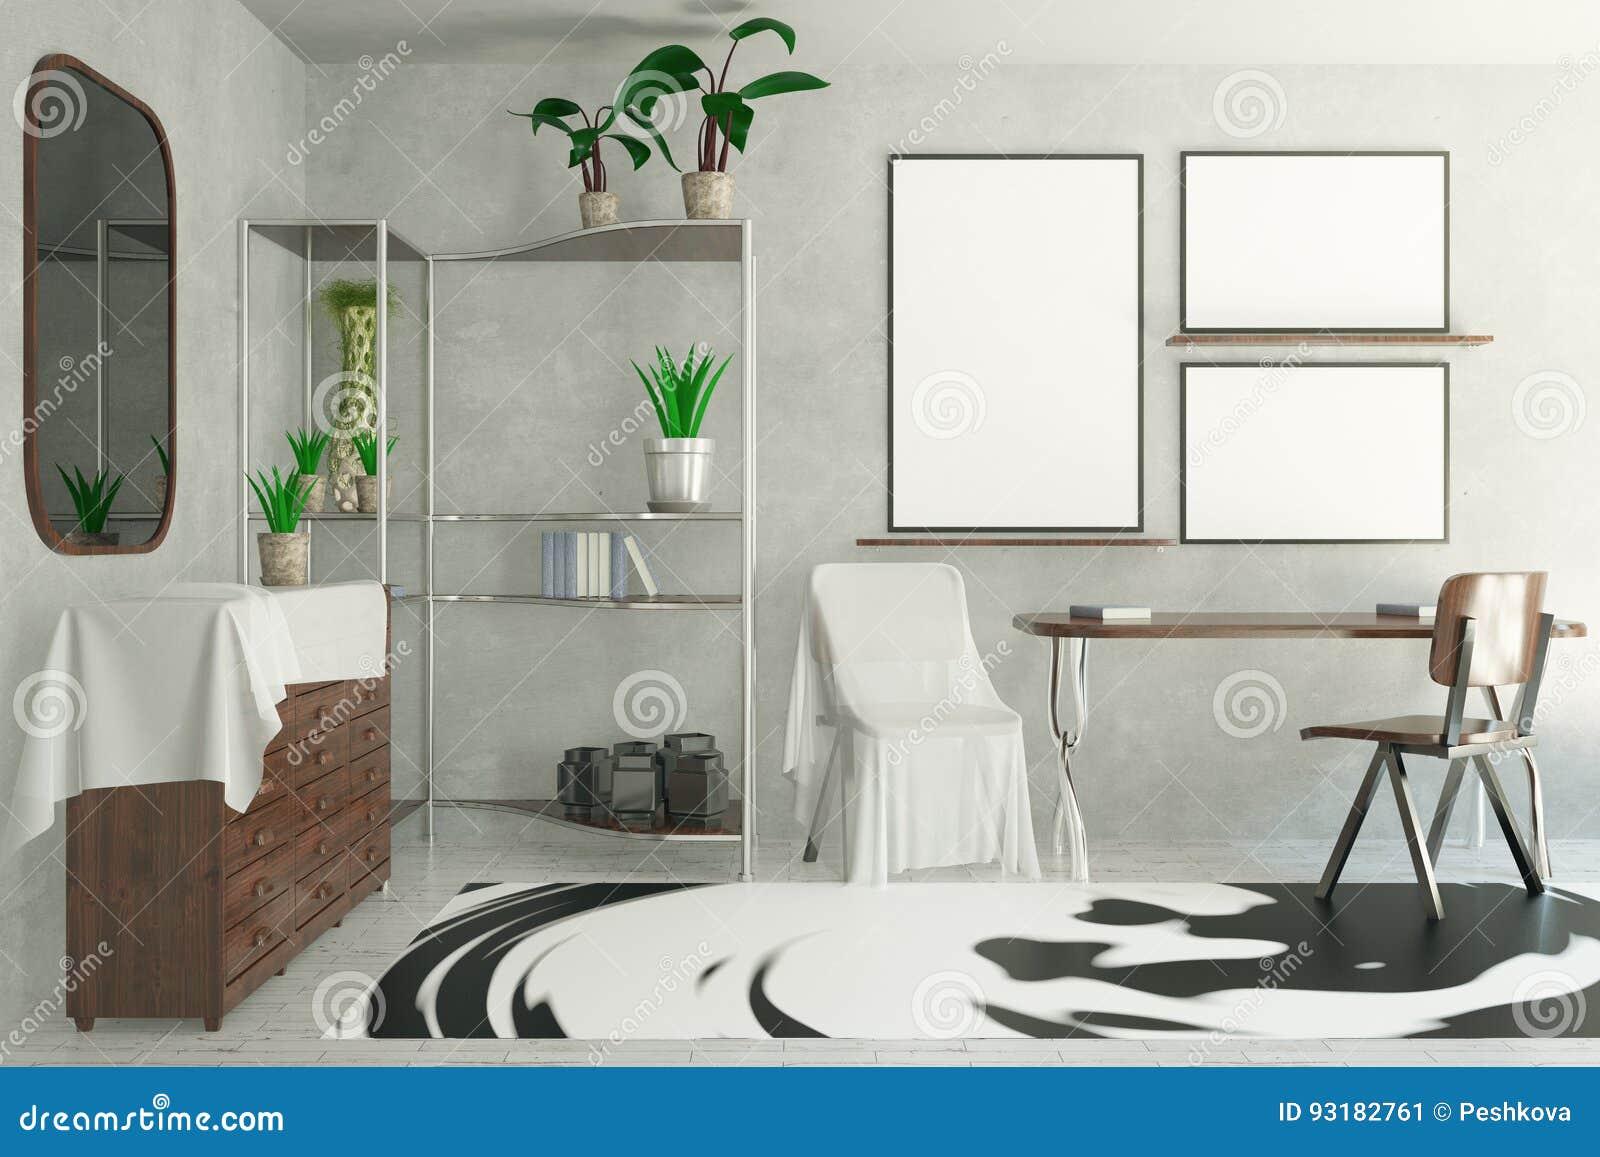 Bright Interior With Empty Frames Stock Illustration - Illustration ...